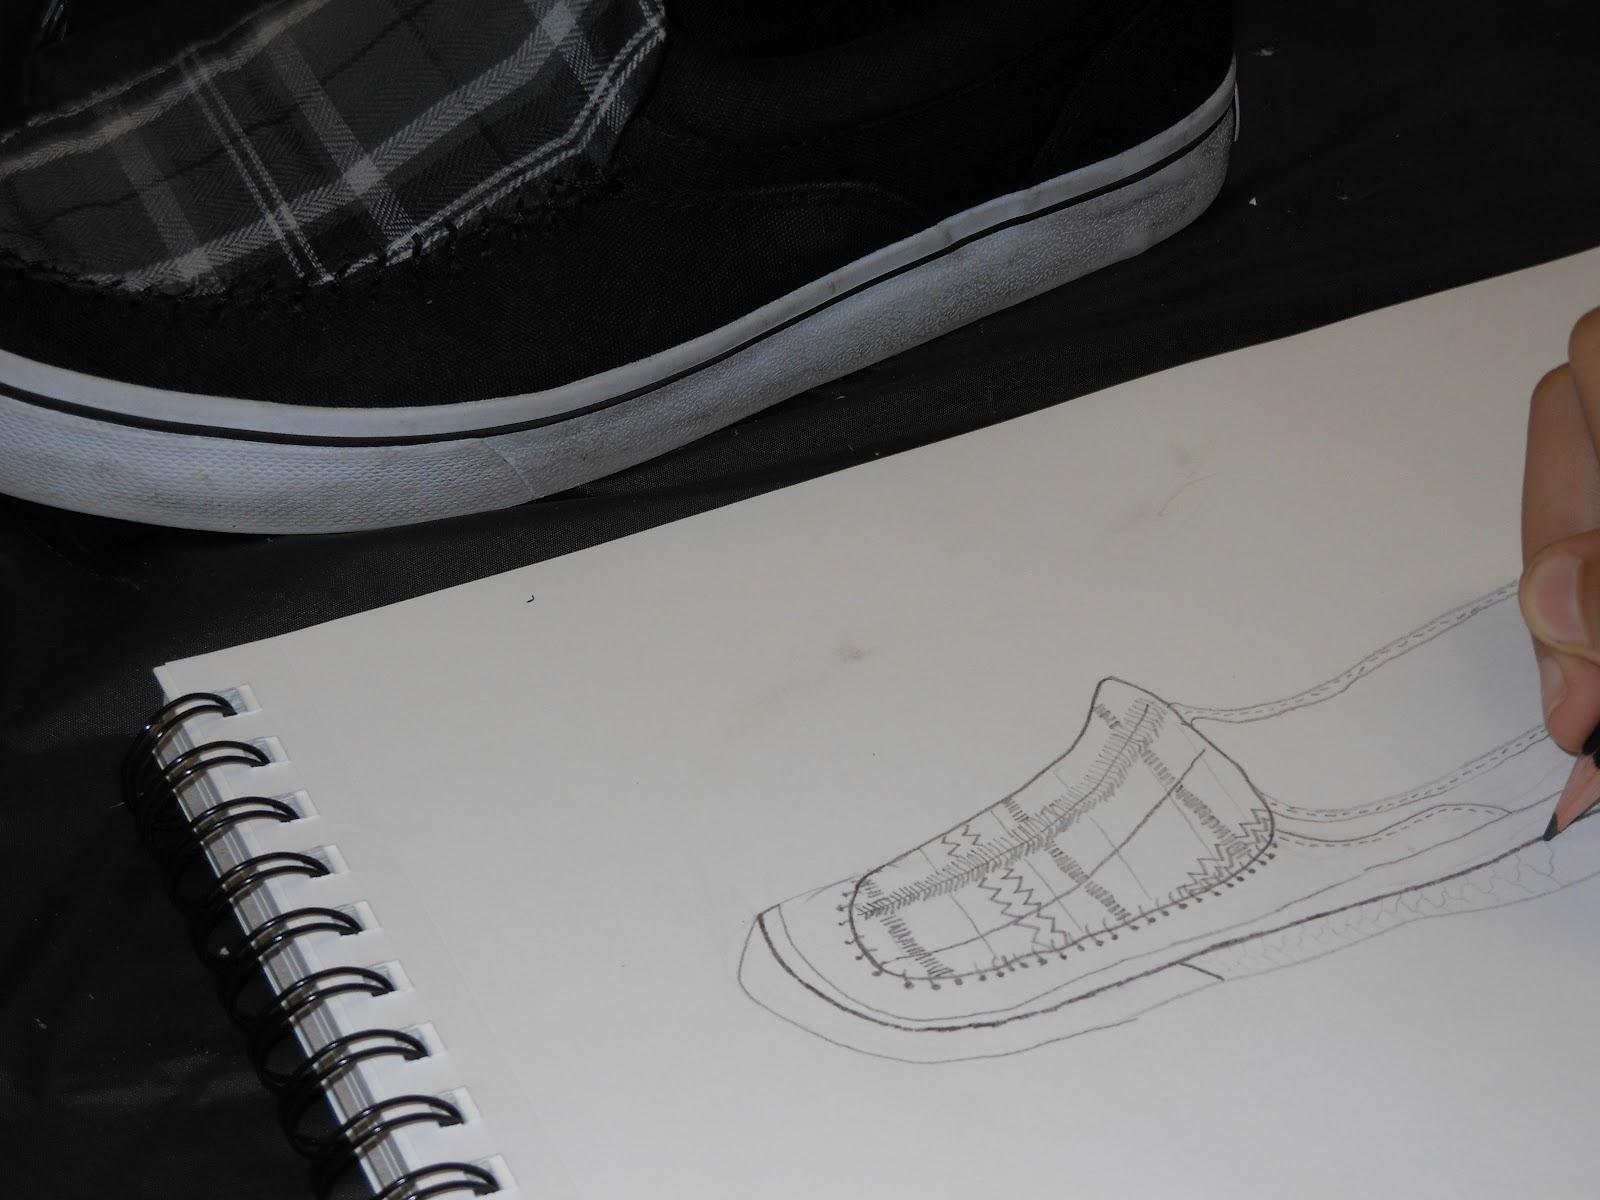 Contour Line Drawing Of A Shoe : Art to go shoe contour line drawings